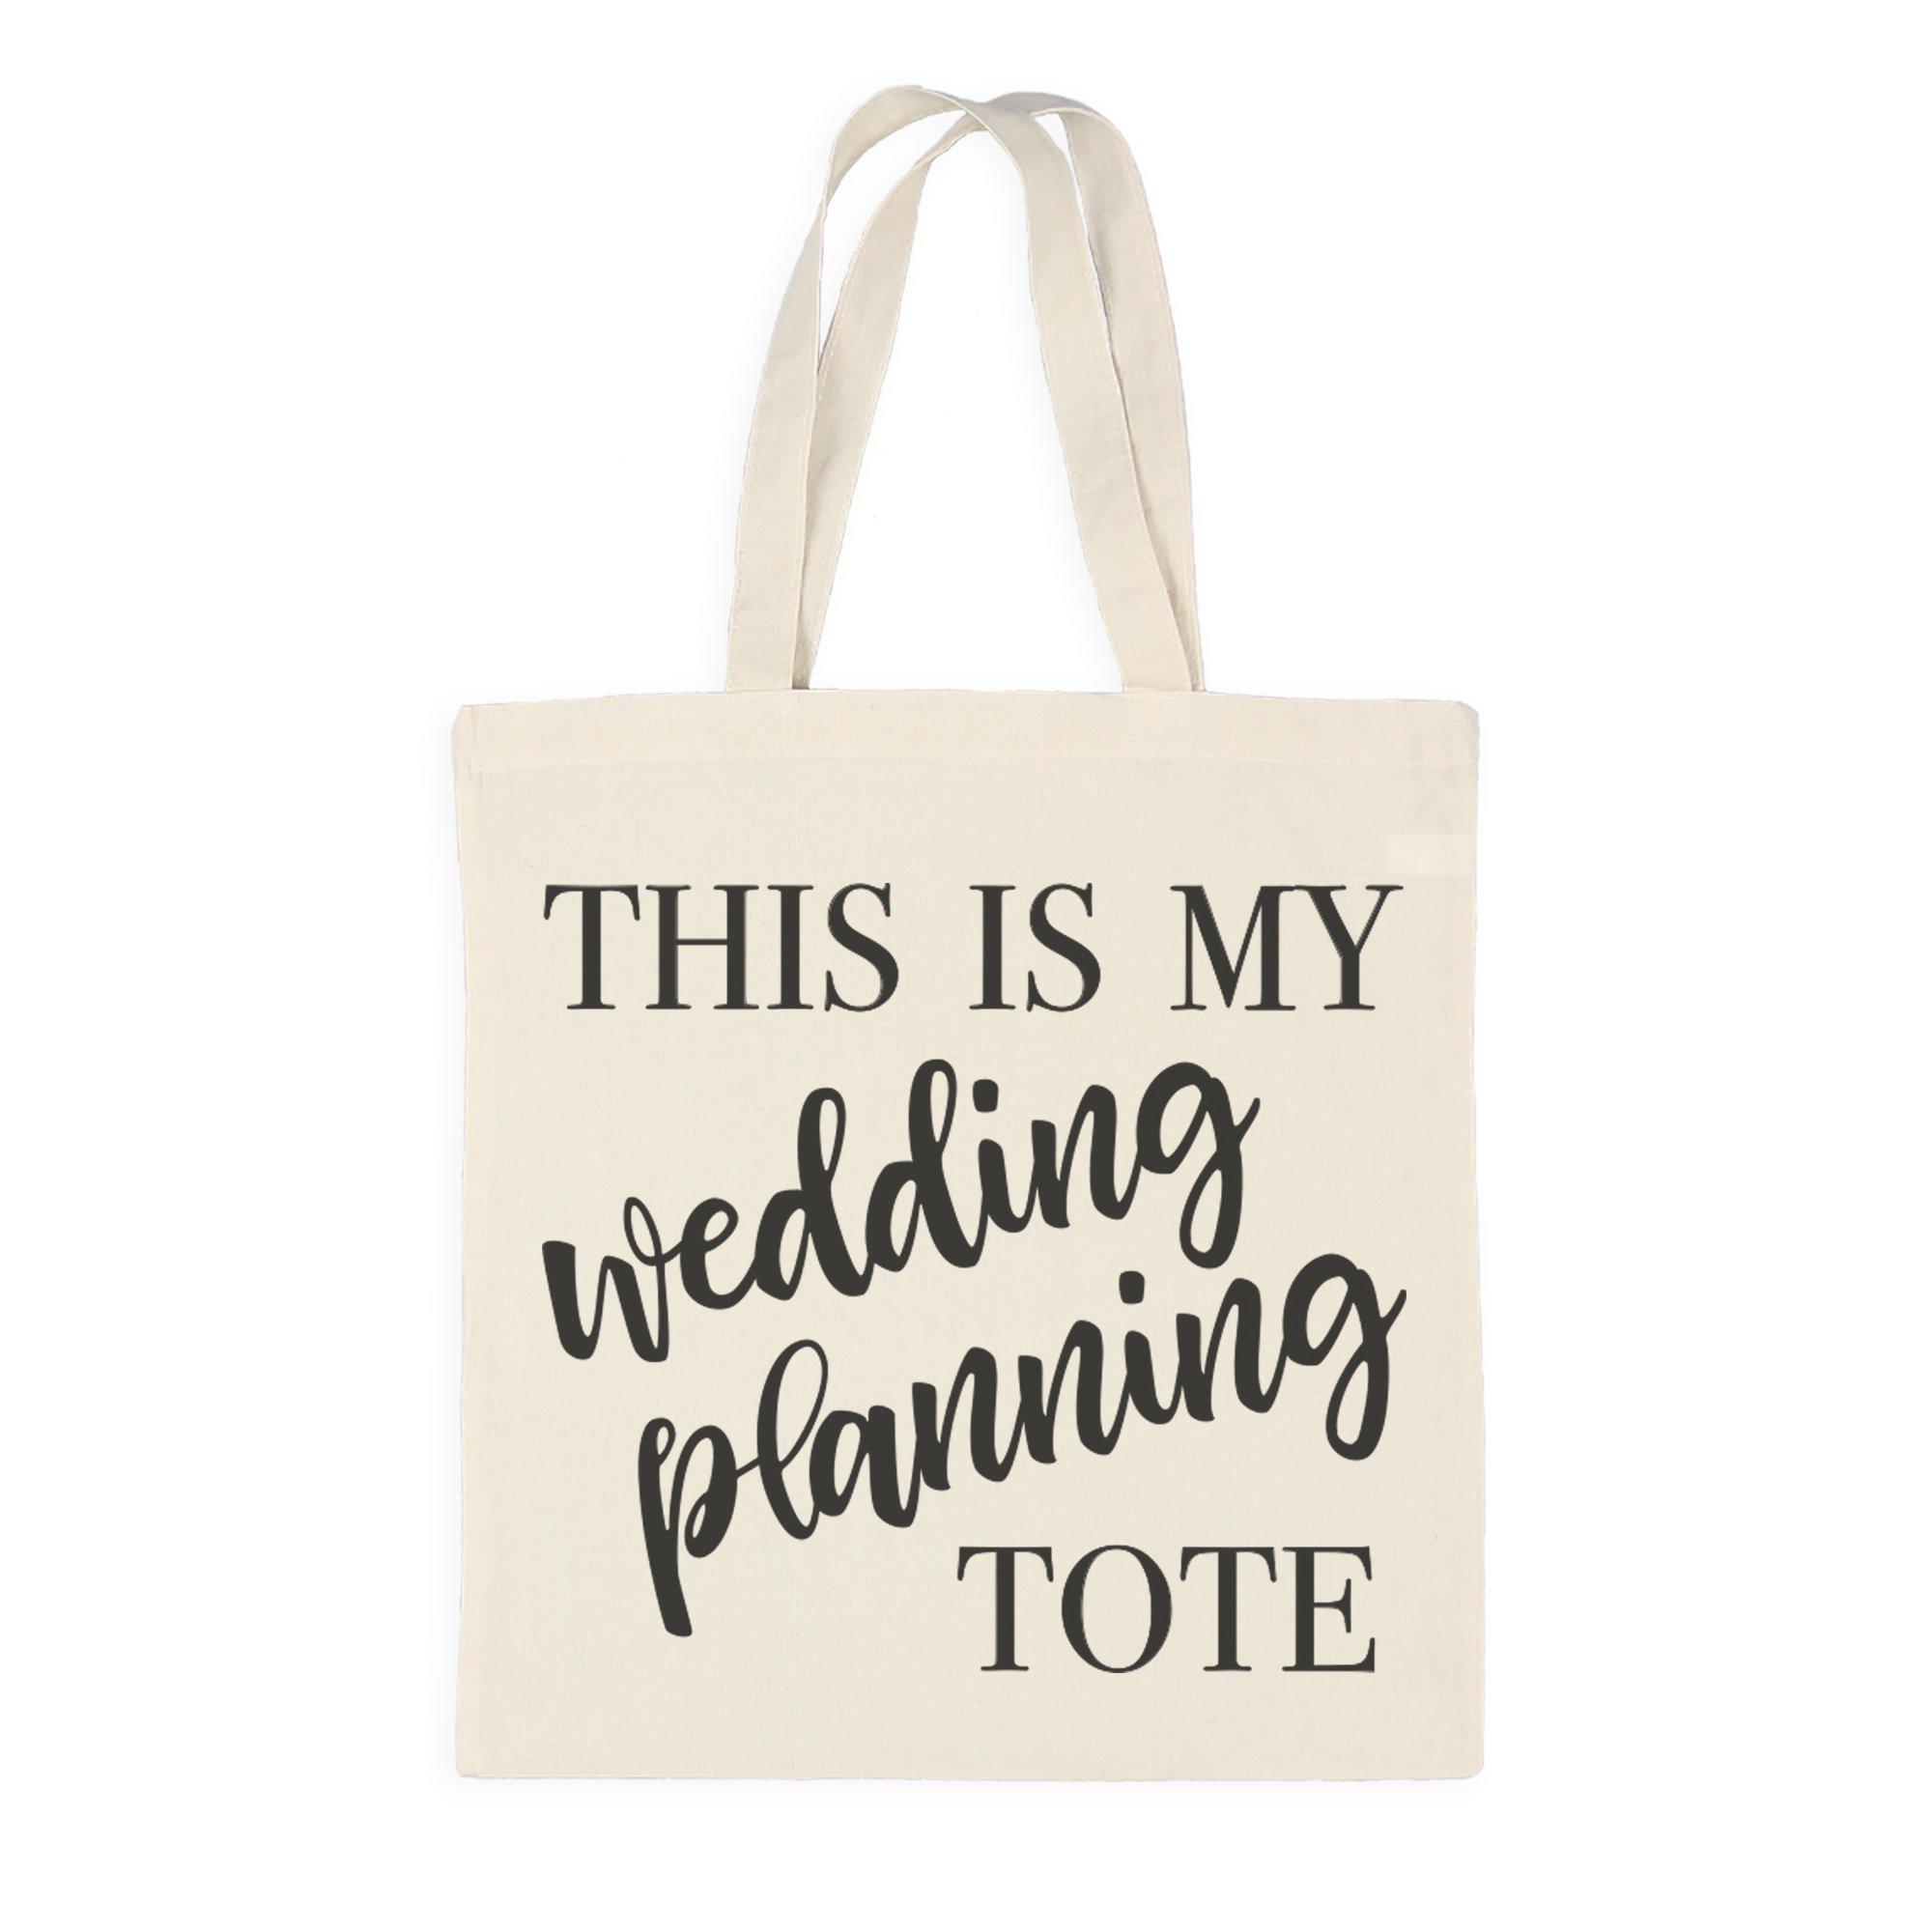 Ivy Lane Design AM1052 Cotton Tote Bag, Wedding Planning